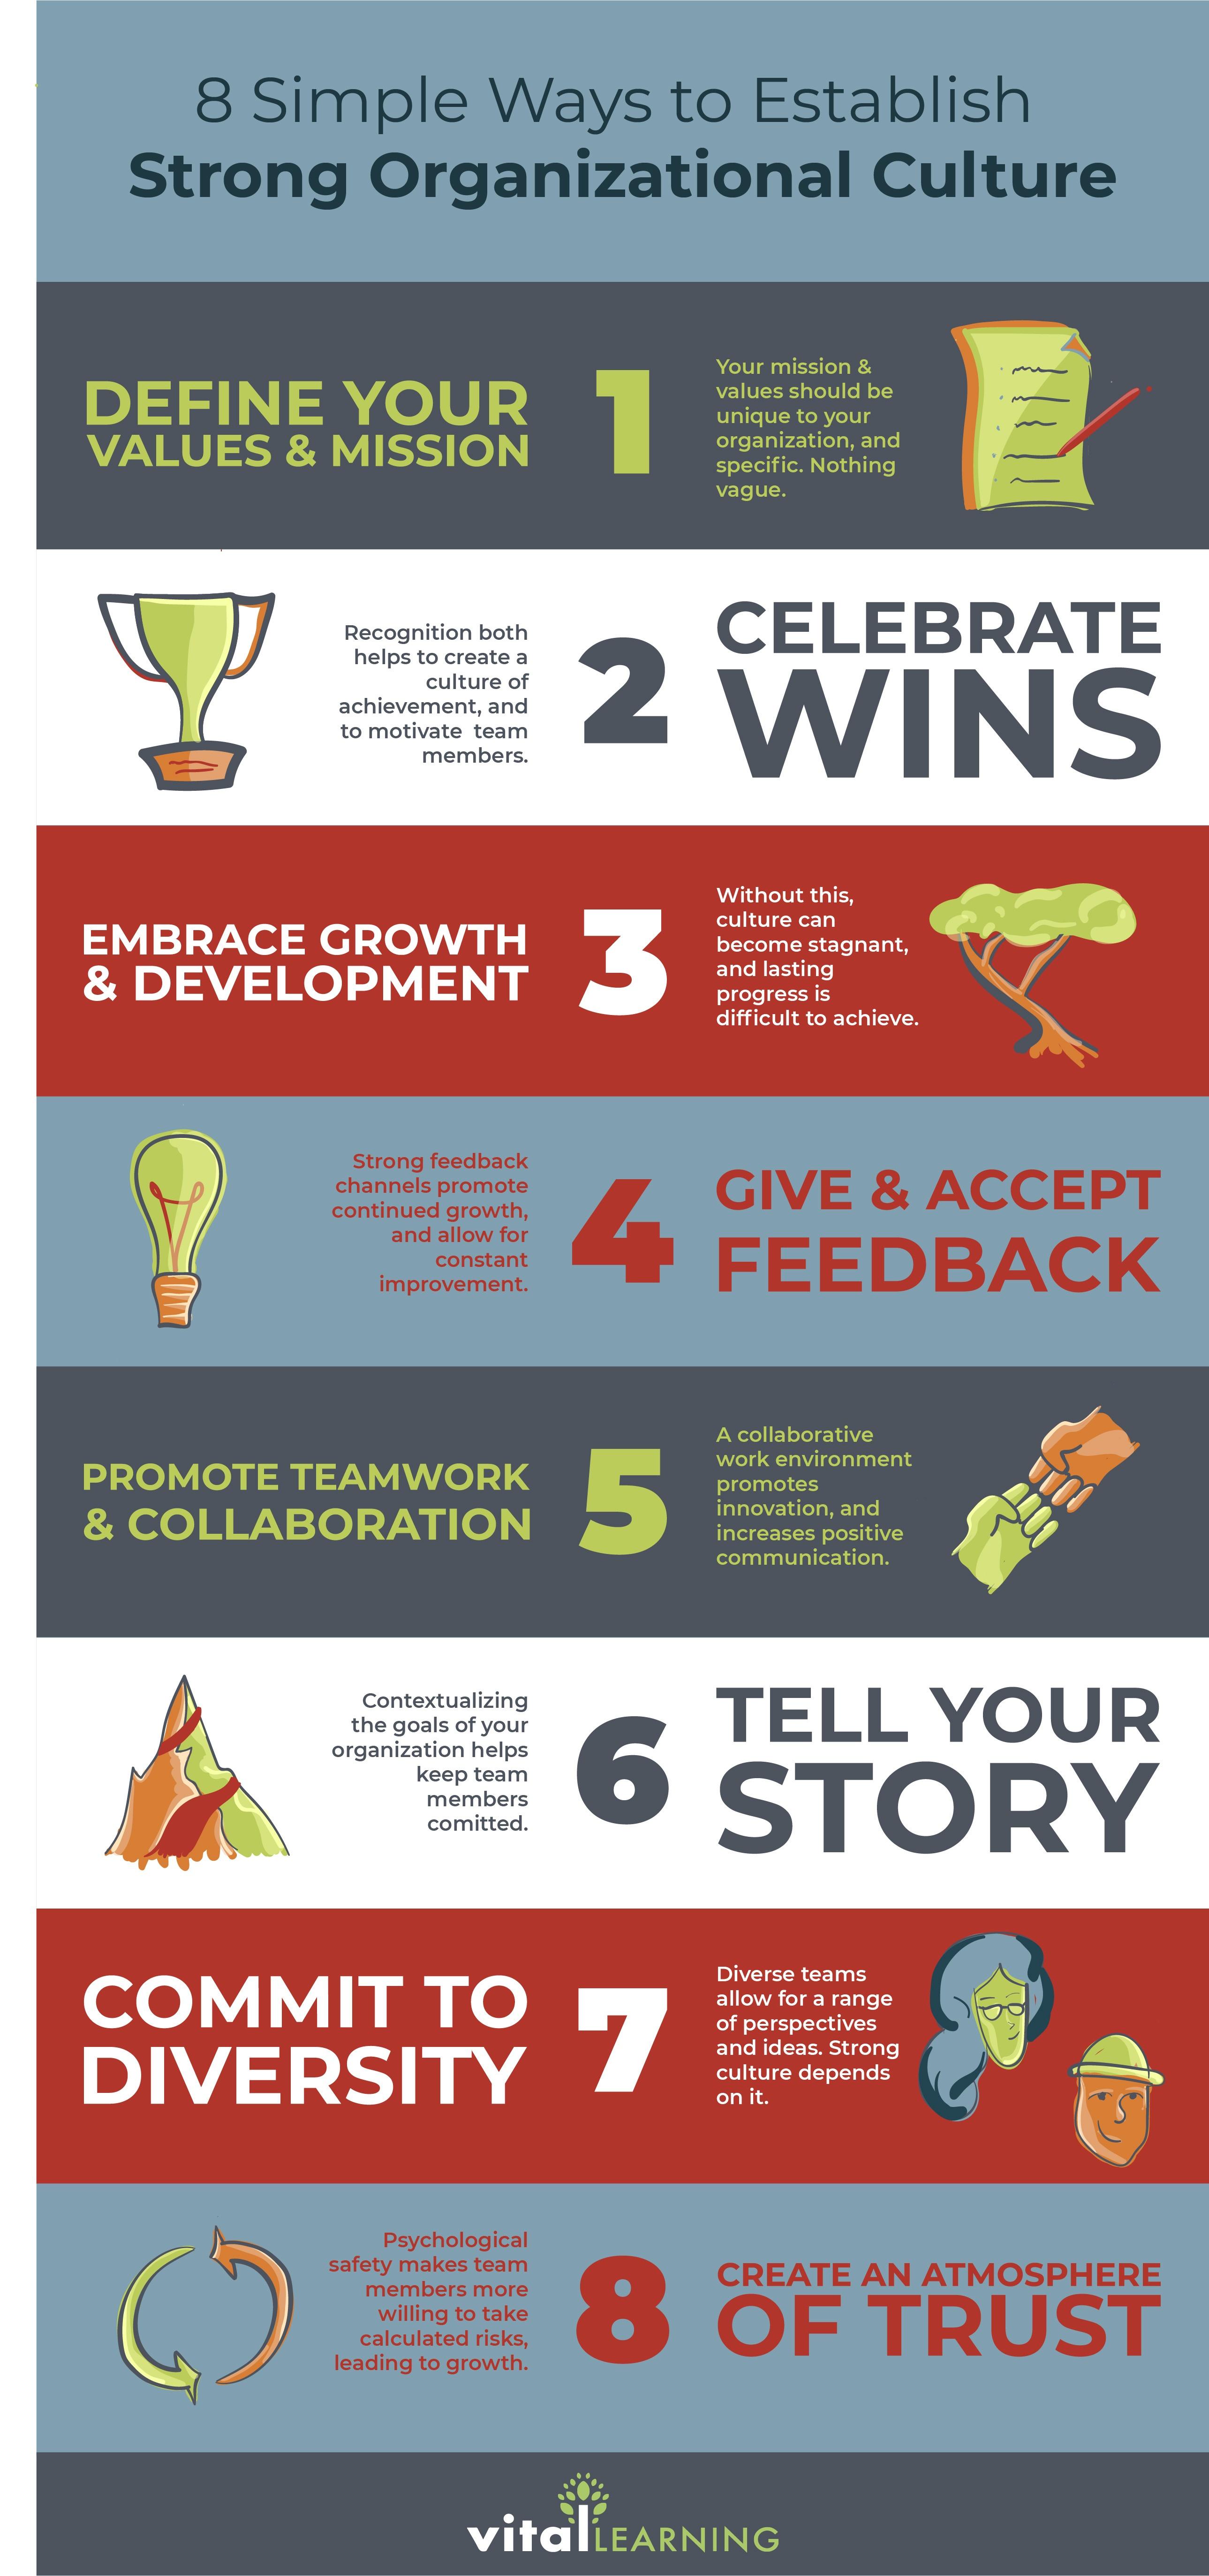 Establish strong organizational culture